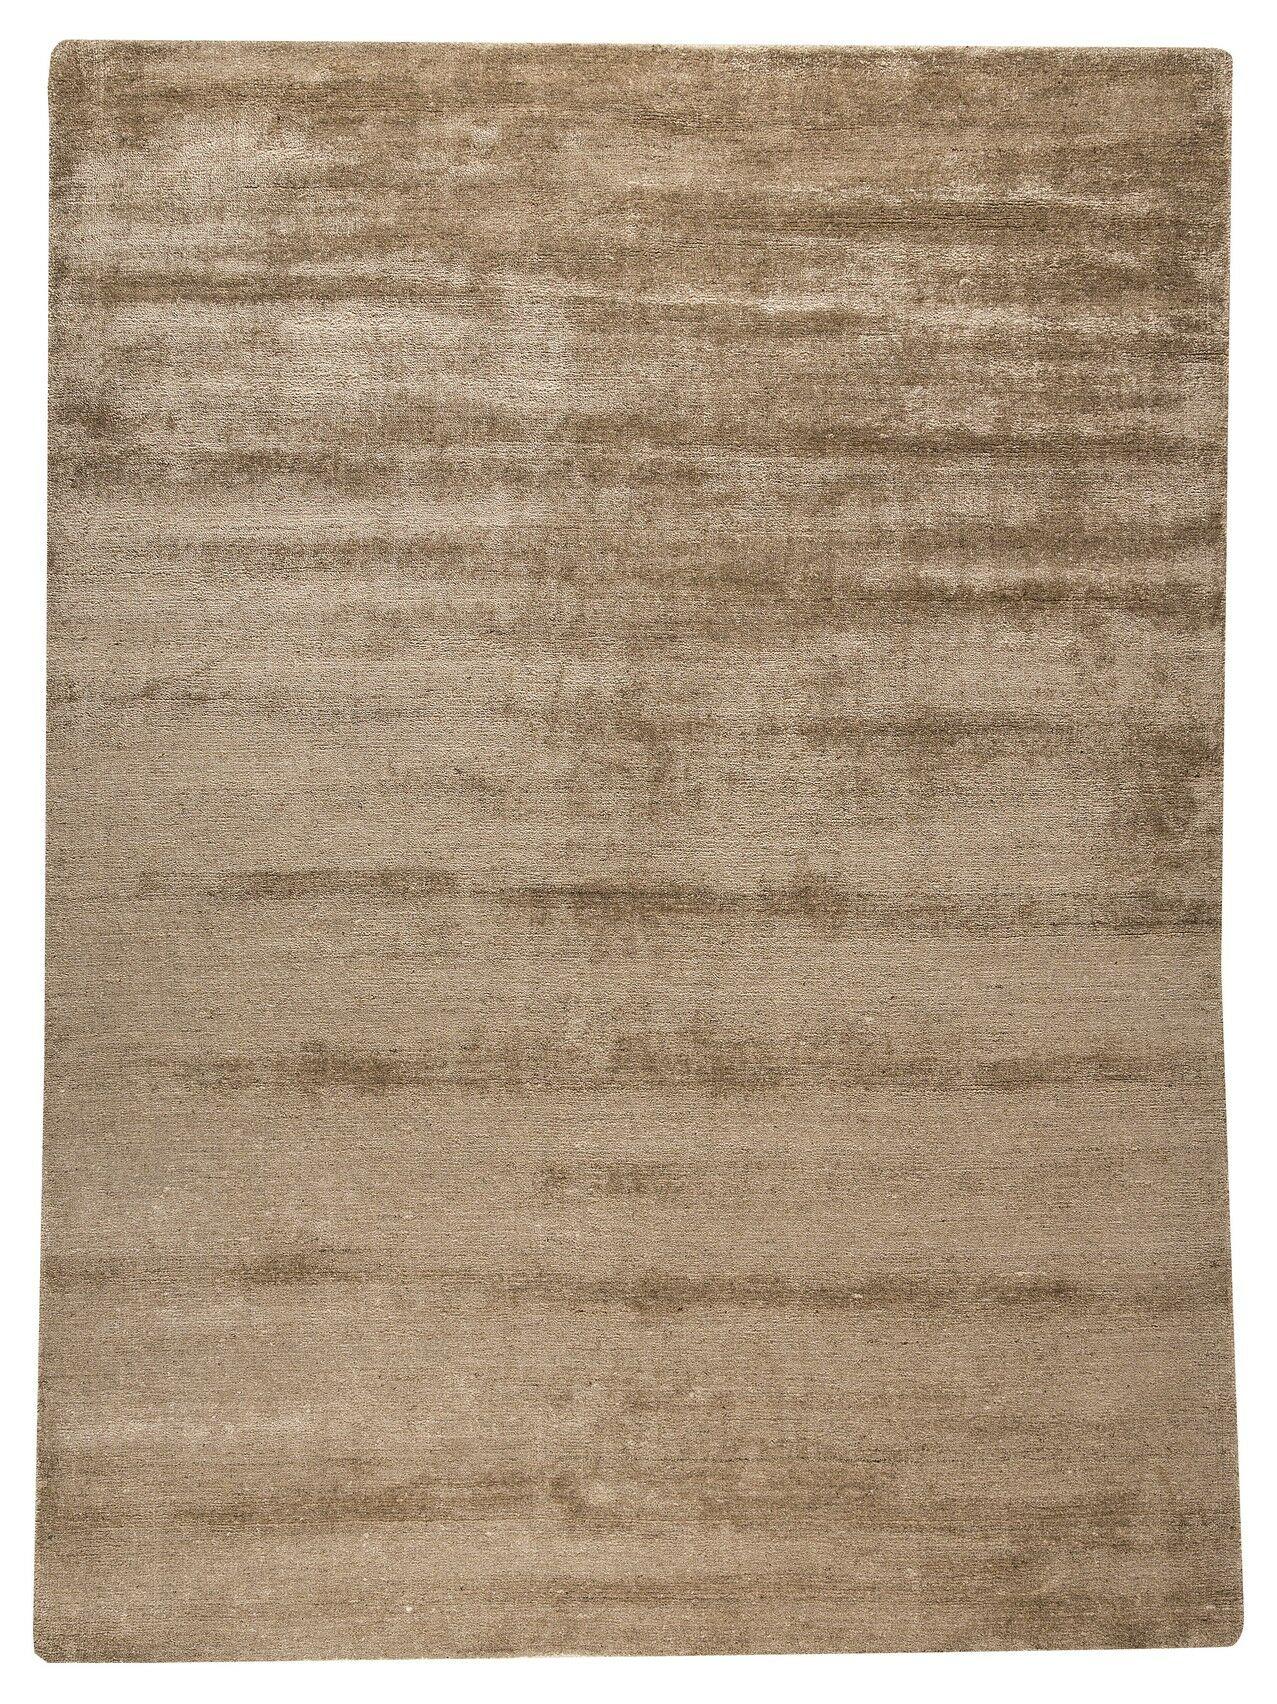 Platinum Hand-Woven Sand Area Rug Rug Size: 5'6